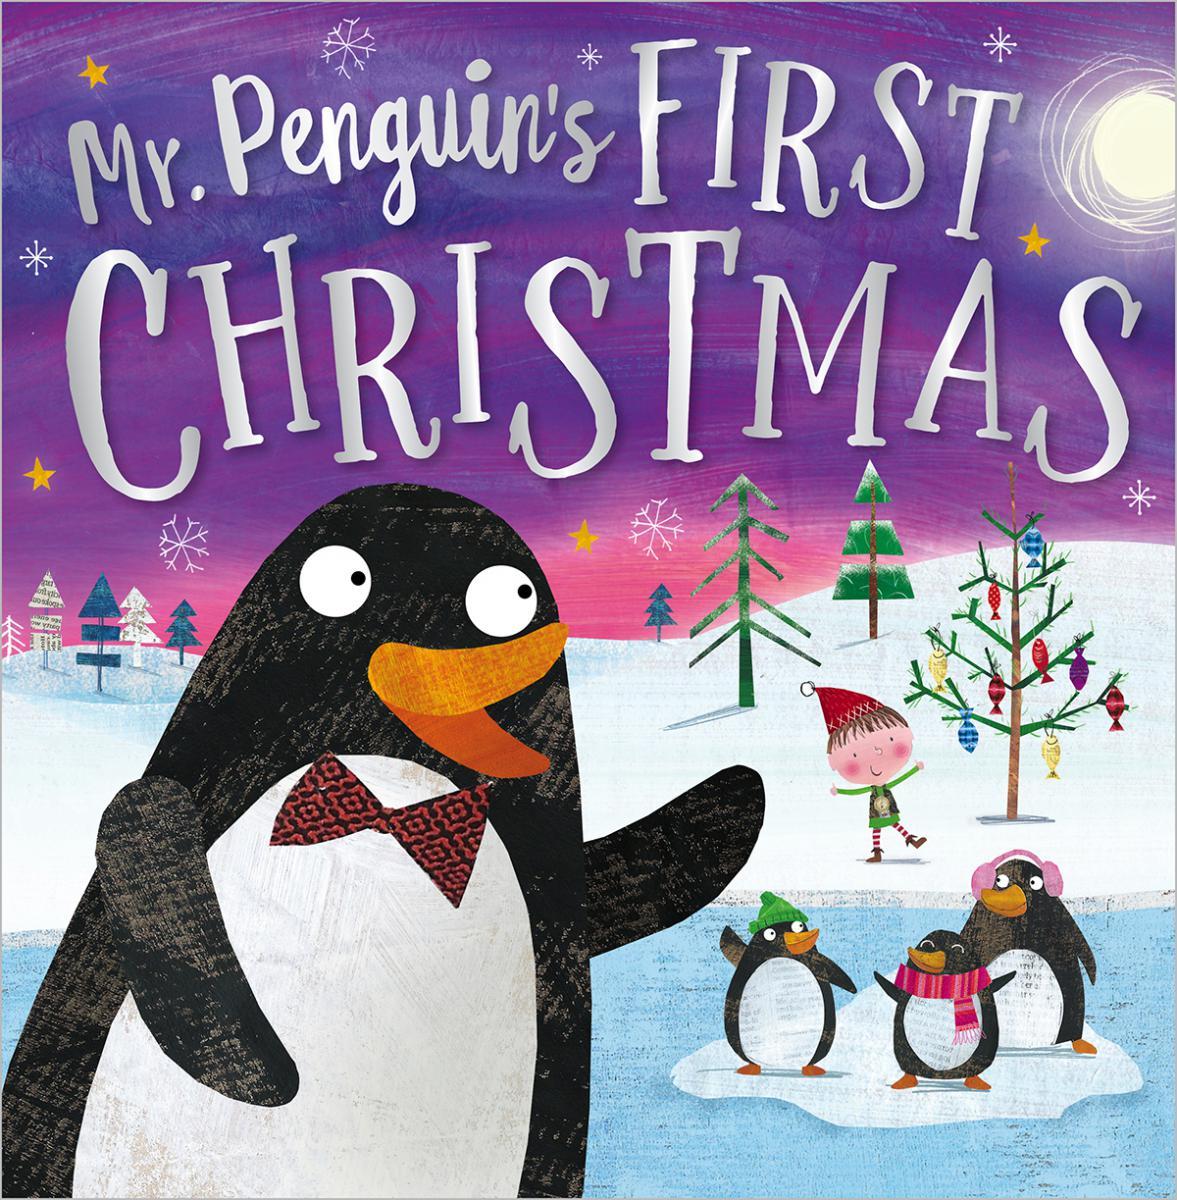 Mr. Penguin's First Christmas